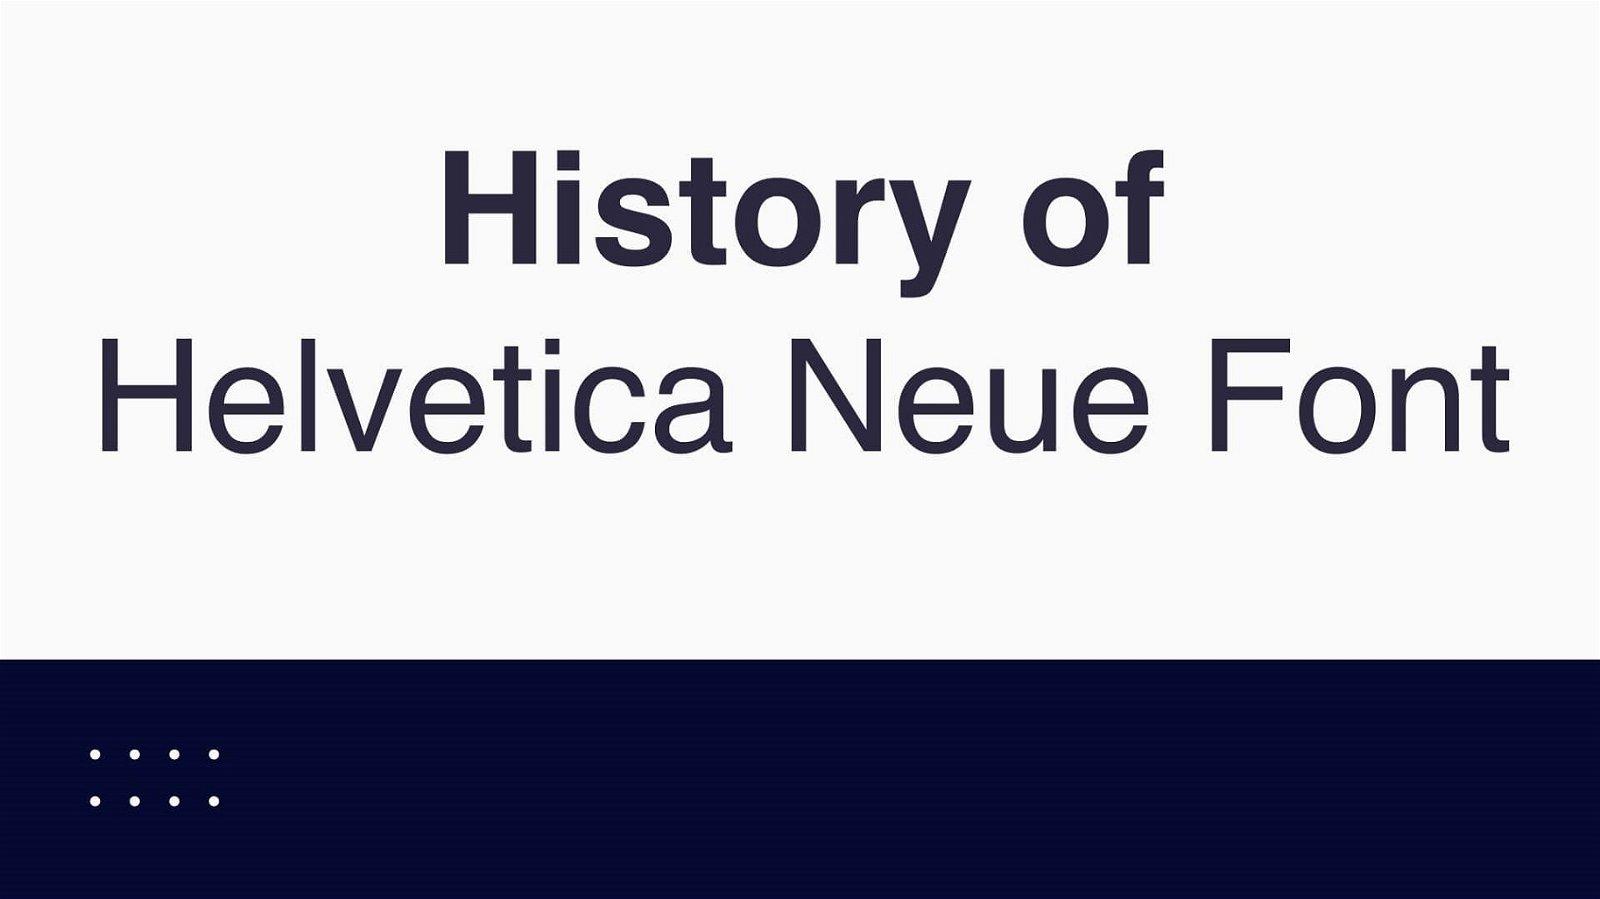 History of Helvetica Neue Font